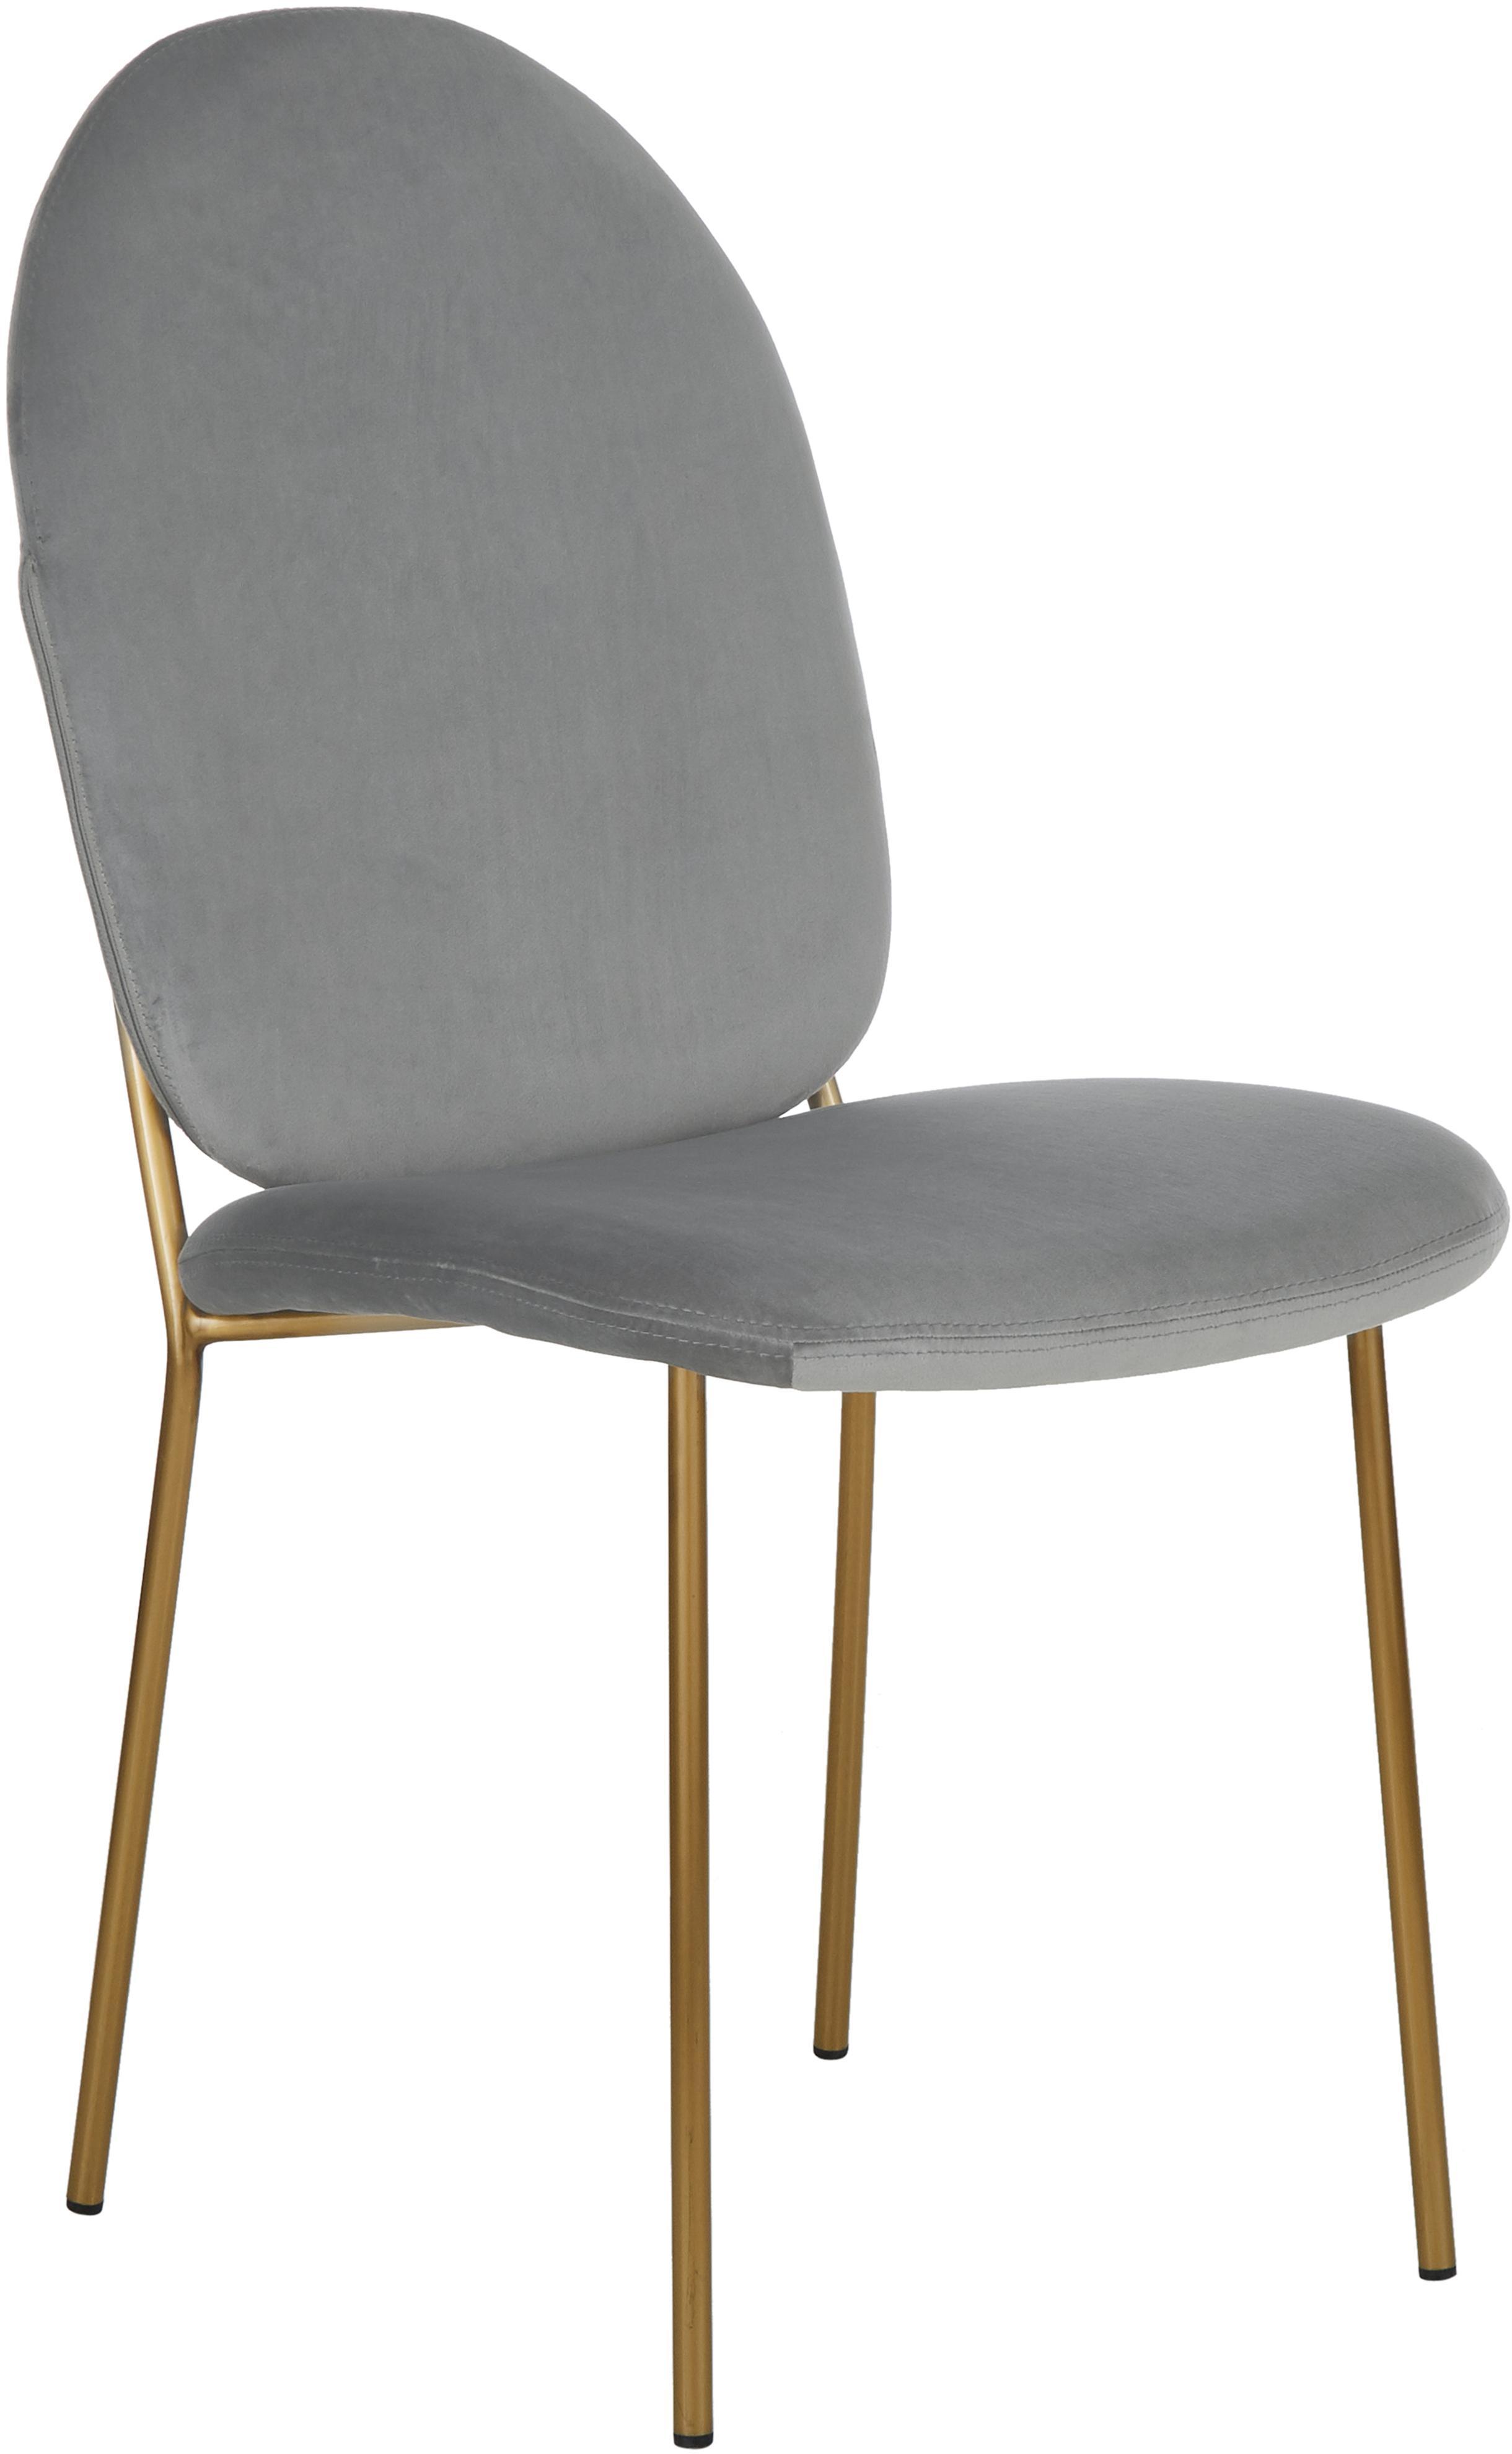 Samt-Polsterstuhl Mary, Bezug: Samt (Polyester) 15.000 S, Beine: Metall, beschichtet, Grau, B 44 x T 65 cm